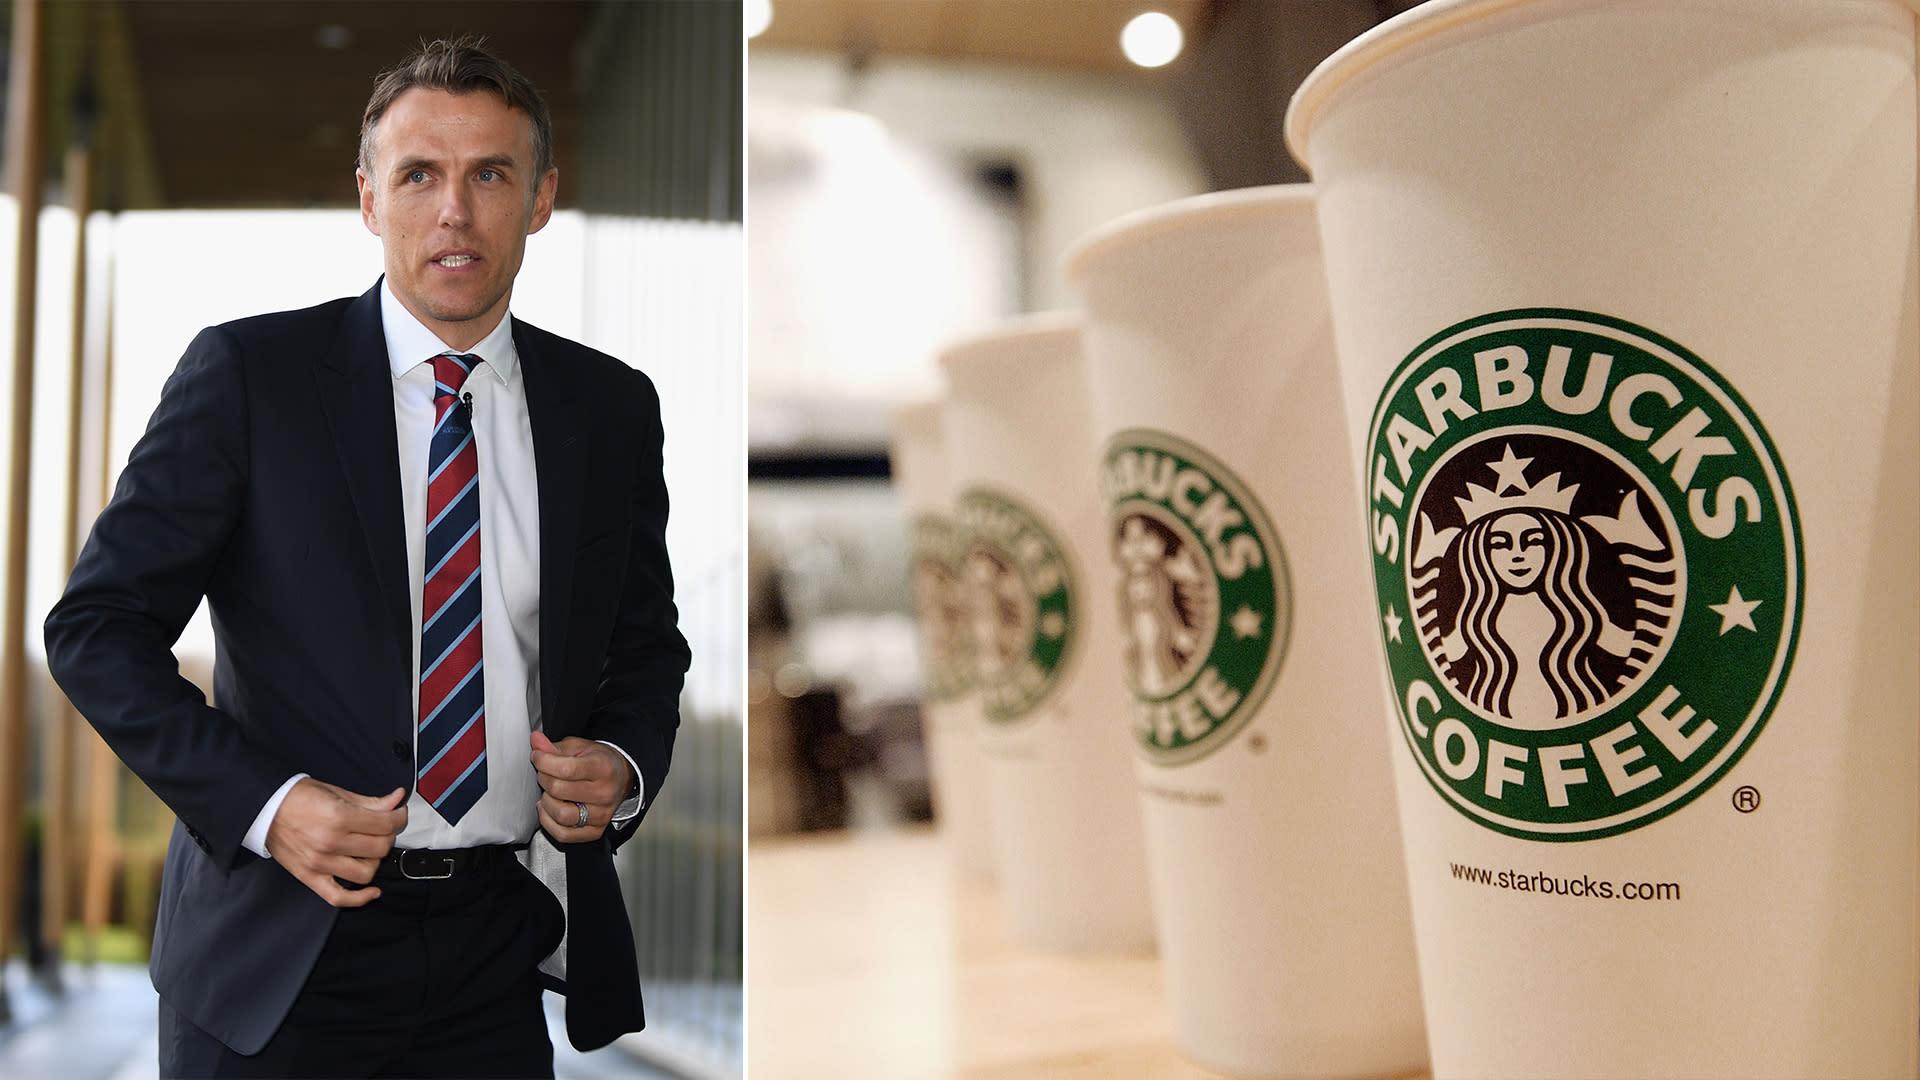 The cheeky message a Starbucks barista sent Phil Neville